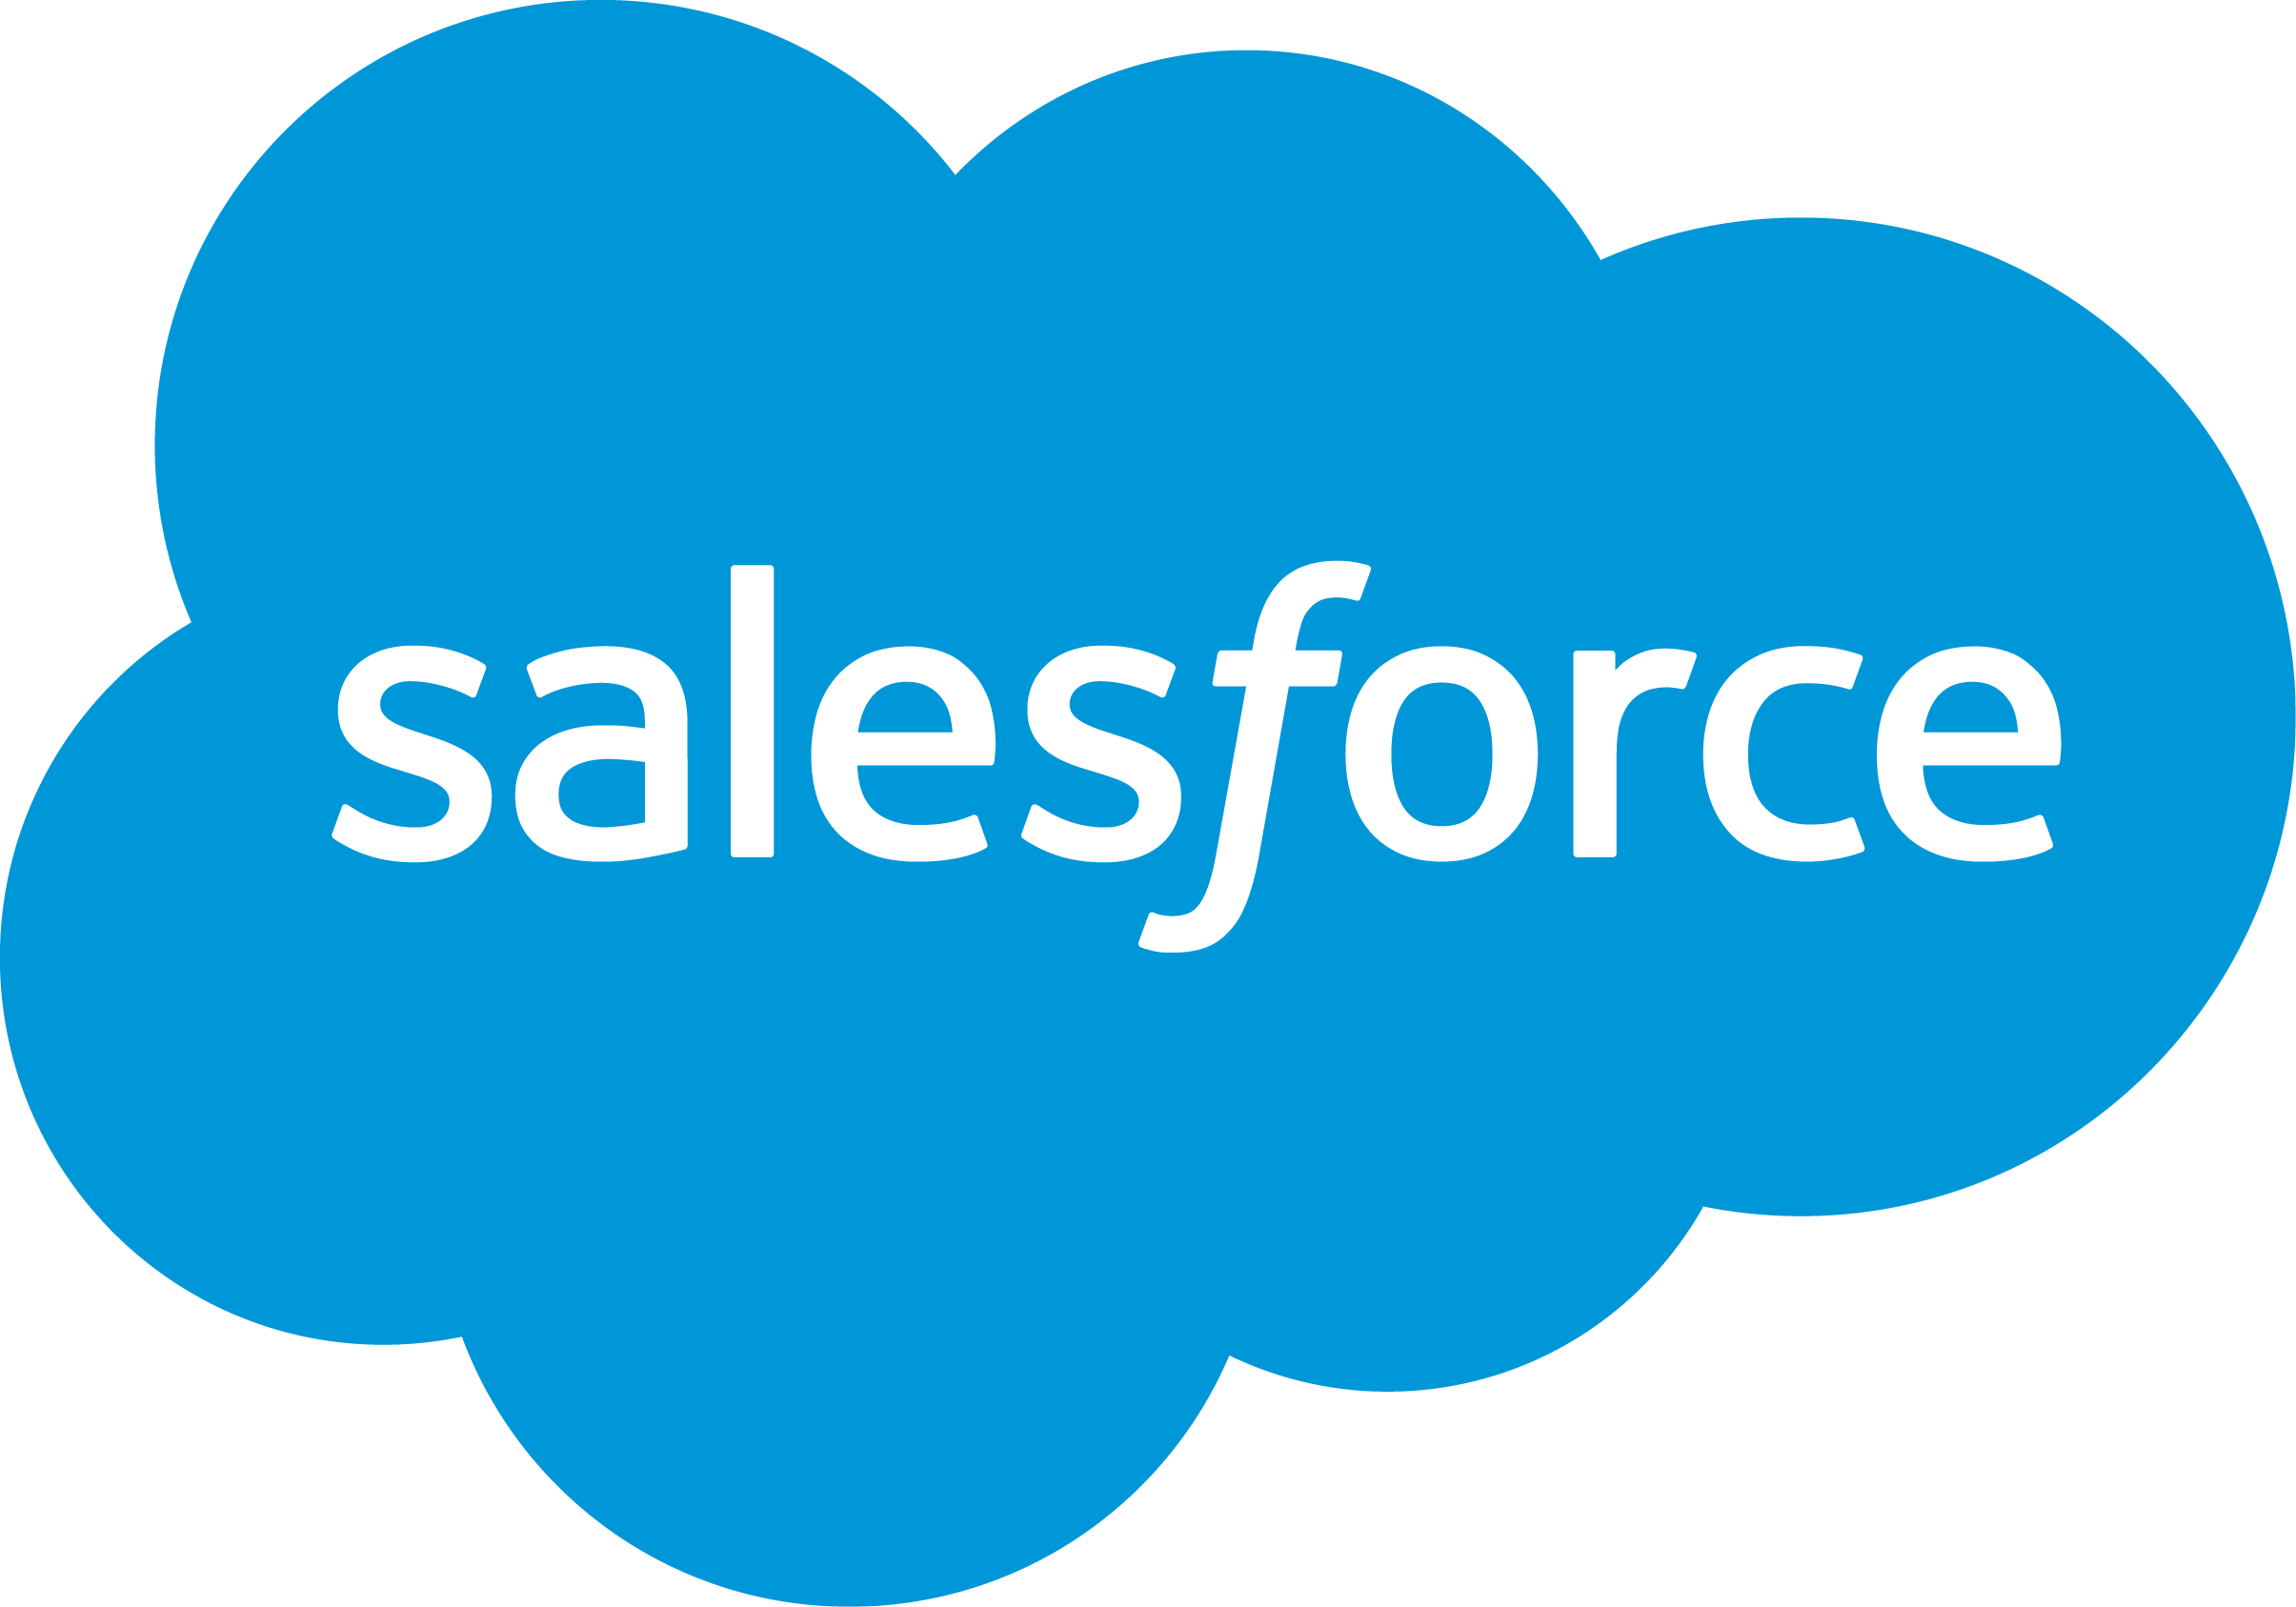 Salesforce Logo [salesforce.com] png